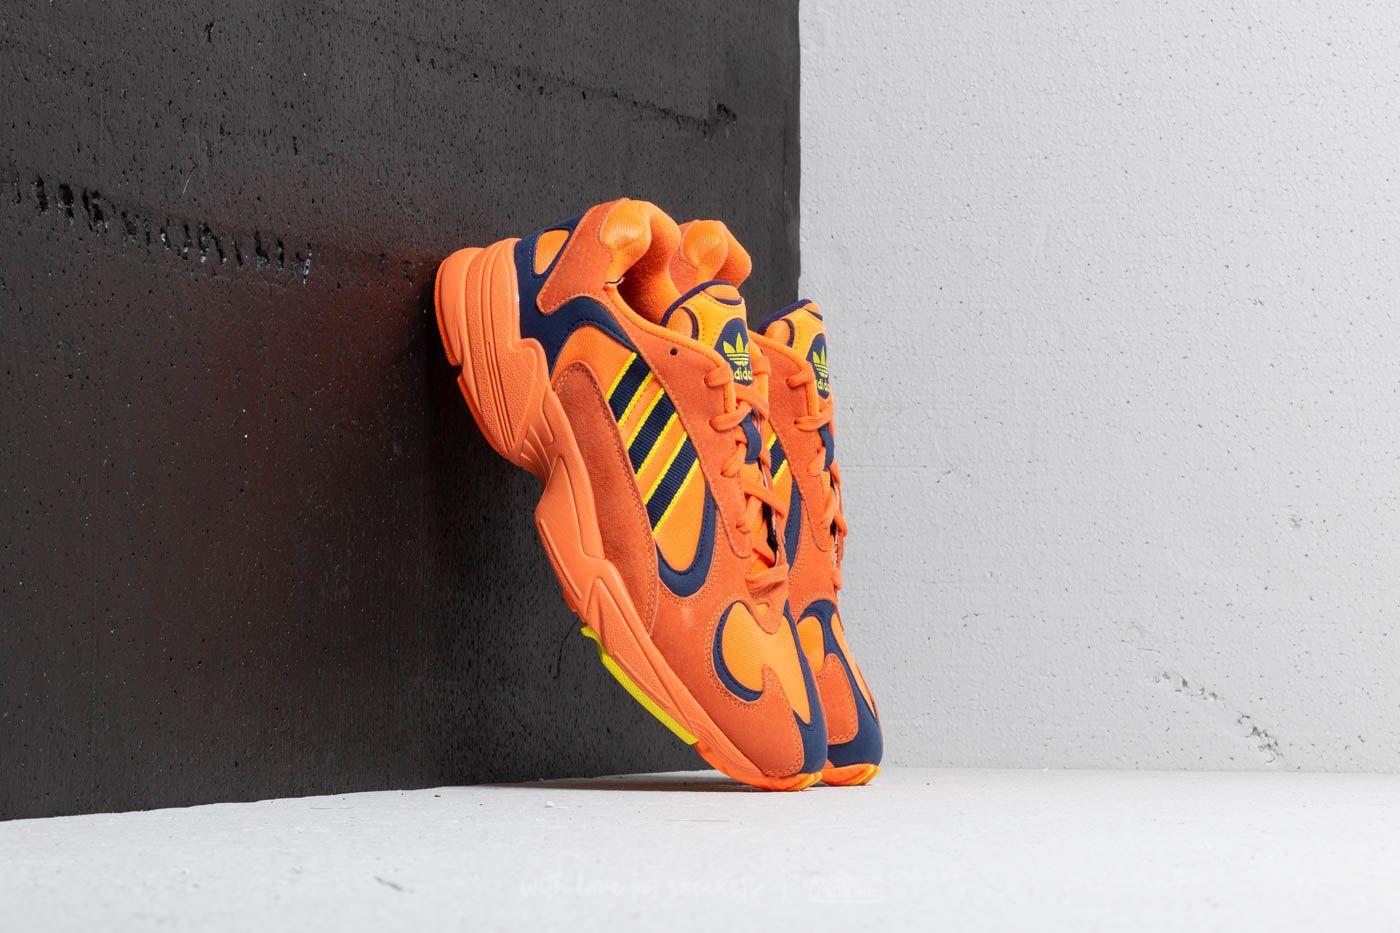 e435d164bf7 adidas Yung 1 Hi-Res Orange  Hi-Res Orange  Shock Yellow at